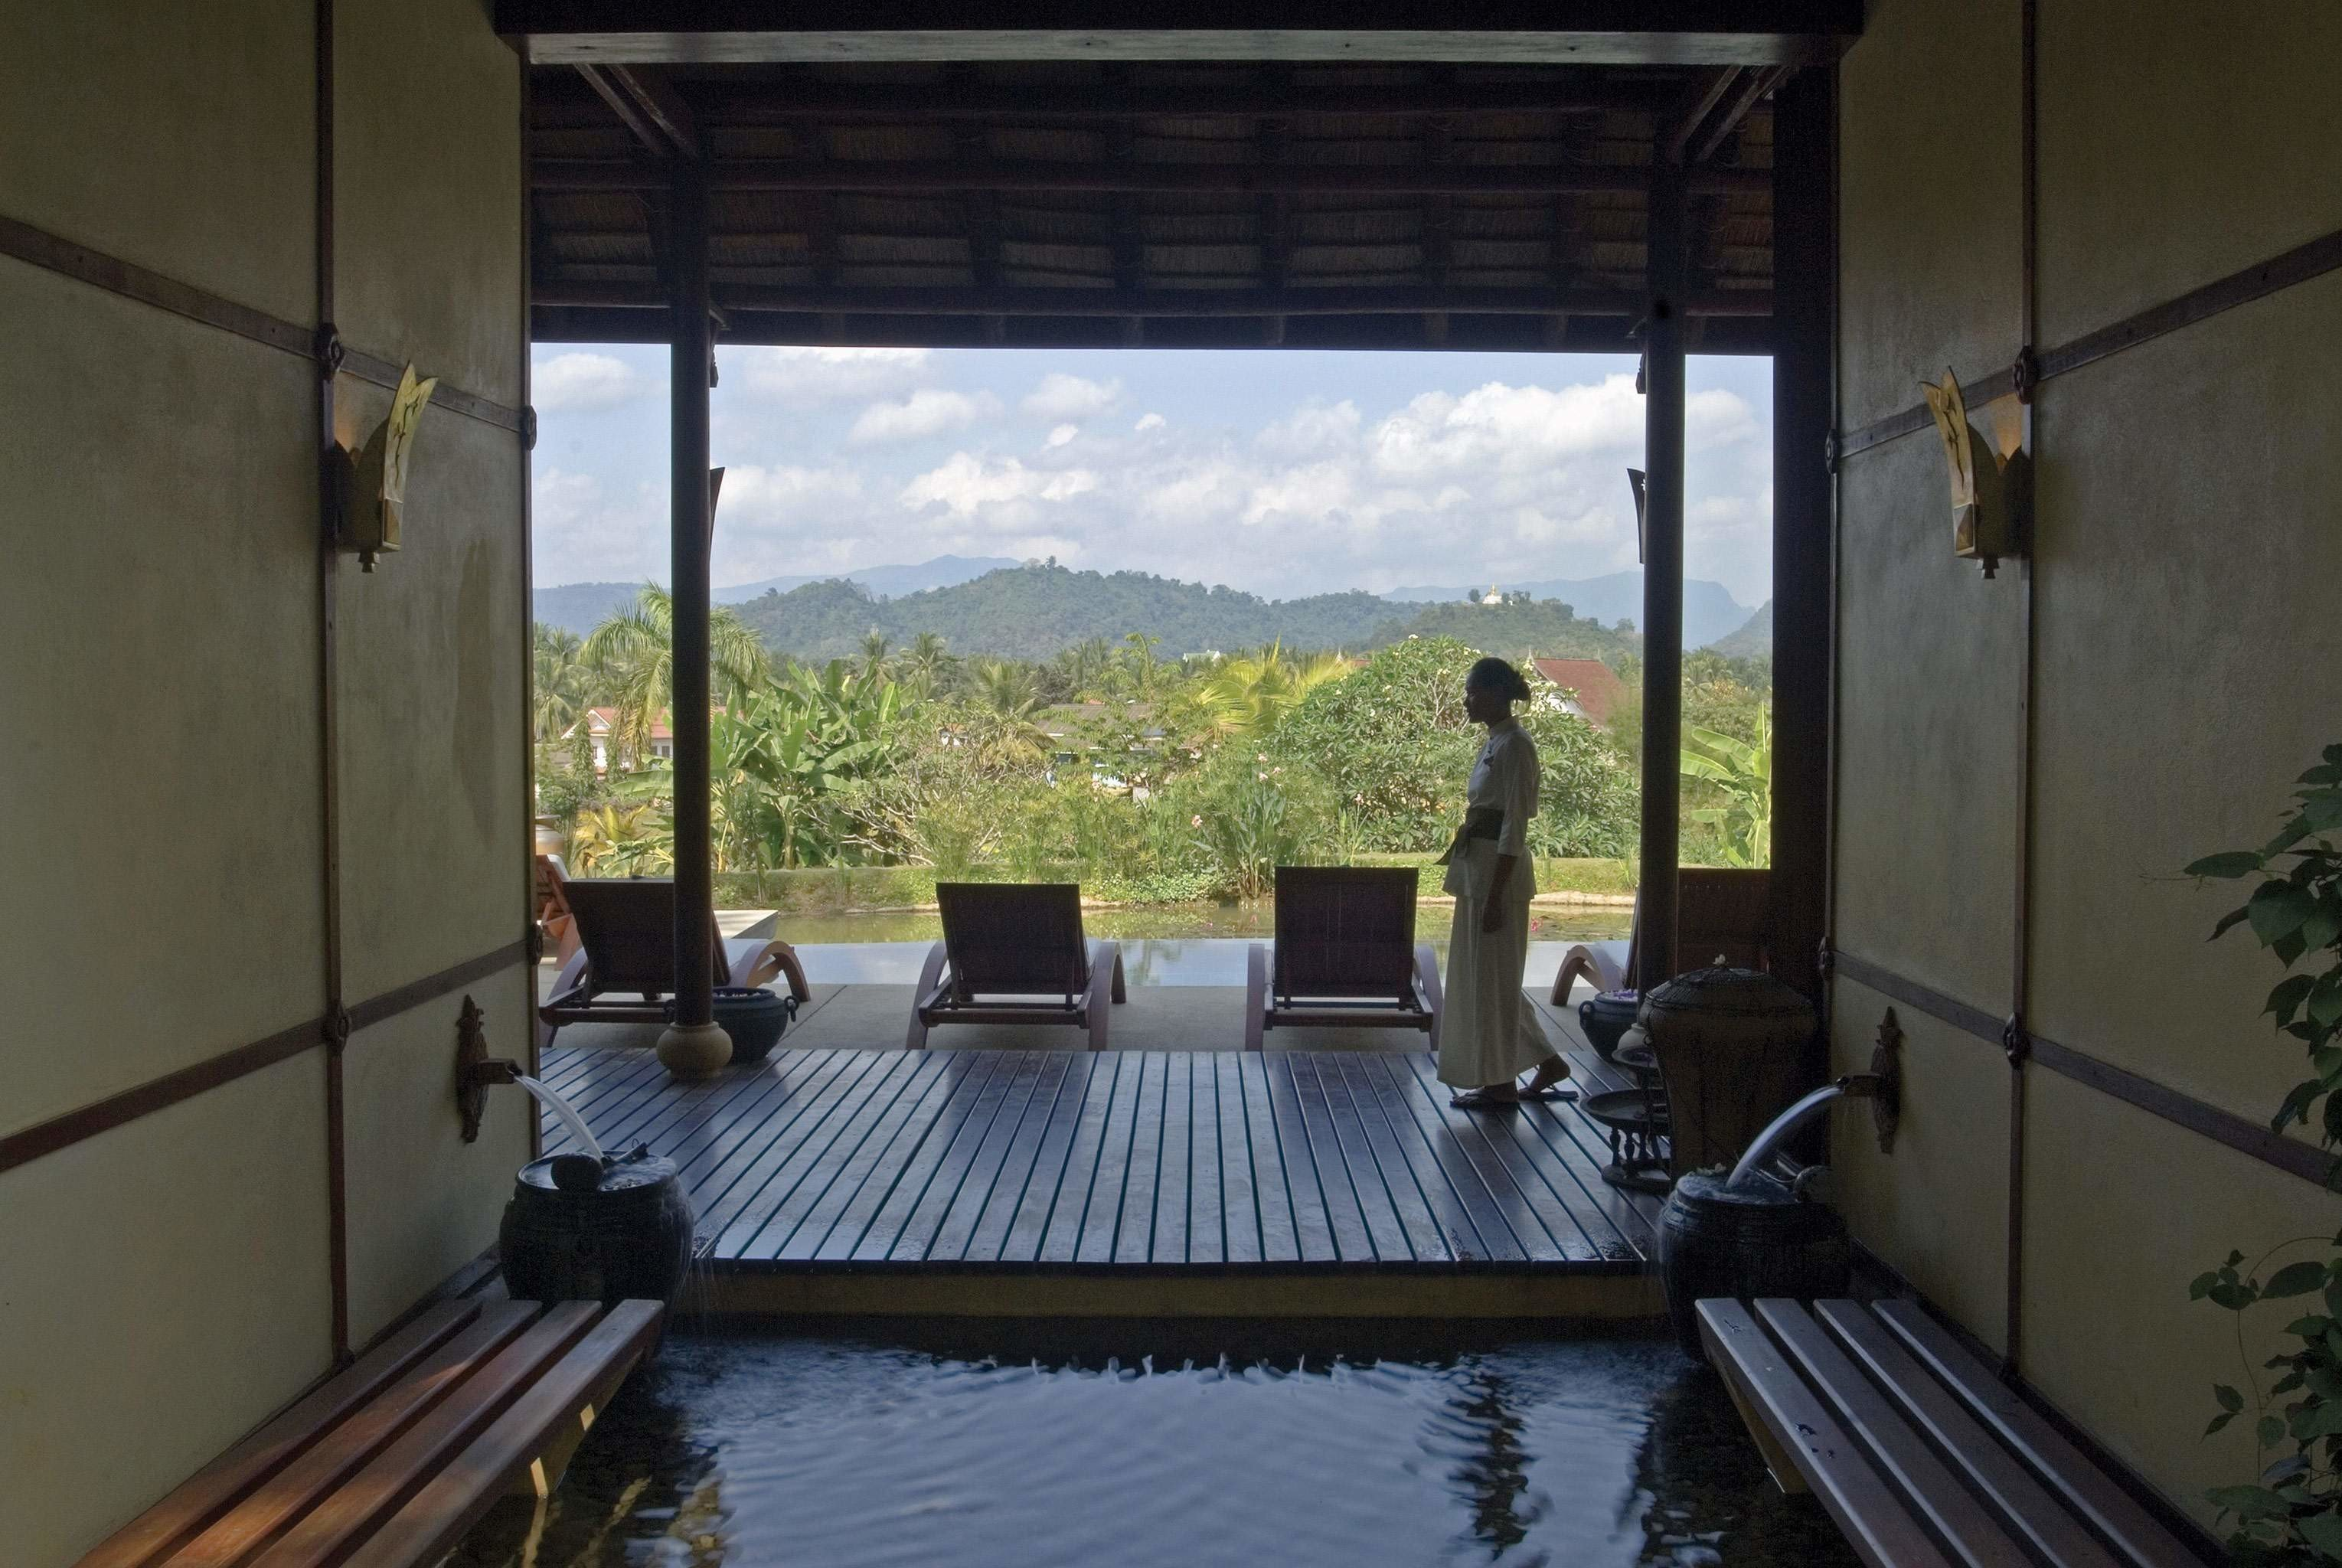 Lounge Luxury Waterfront property building swimming pool Villa cottage condominium